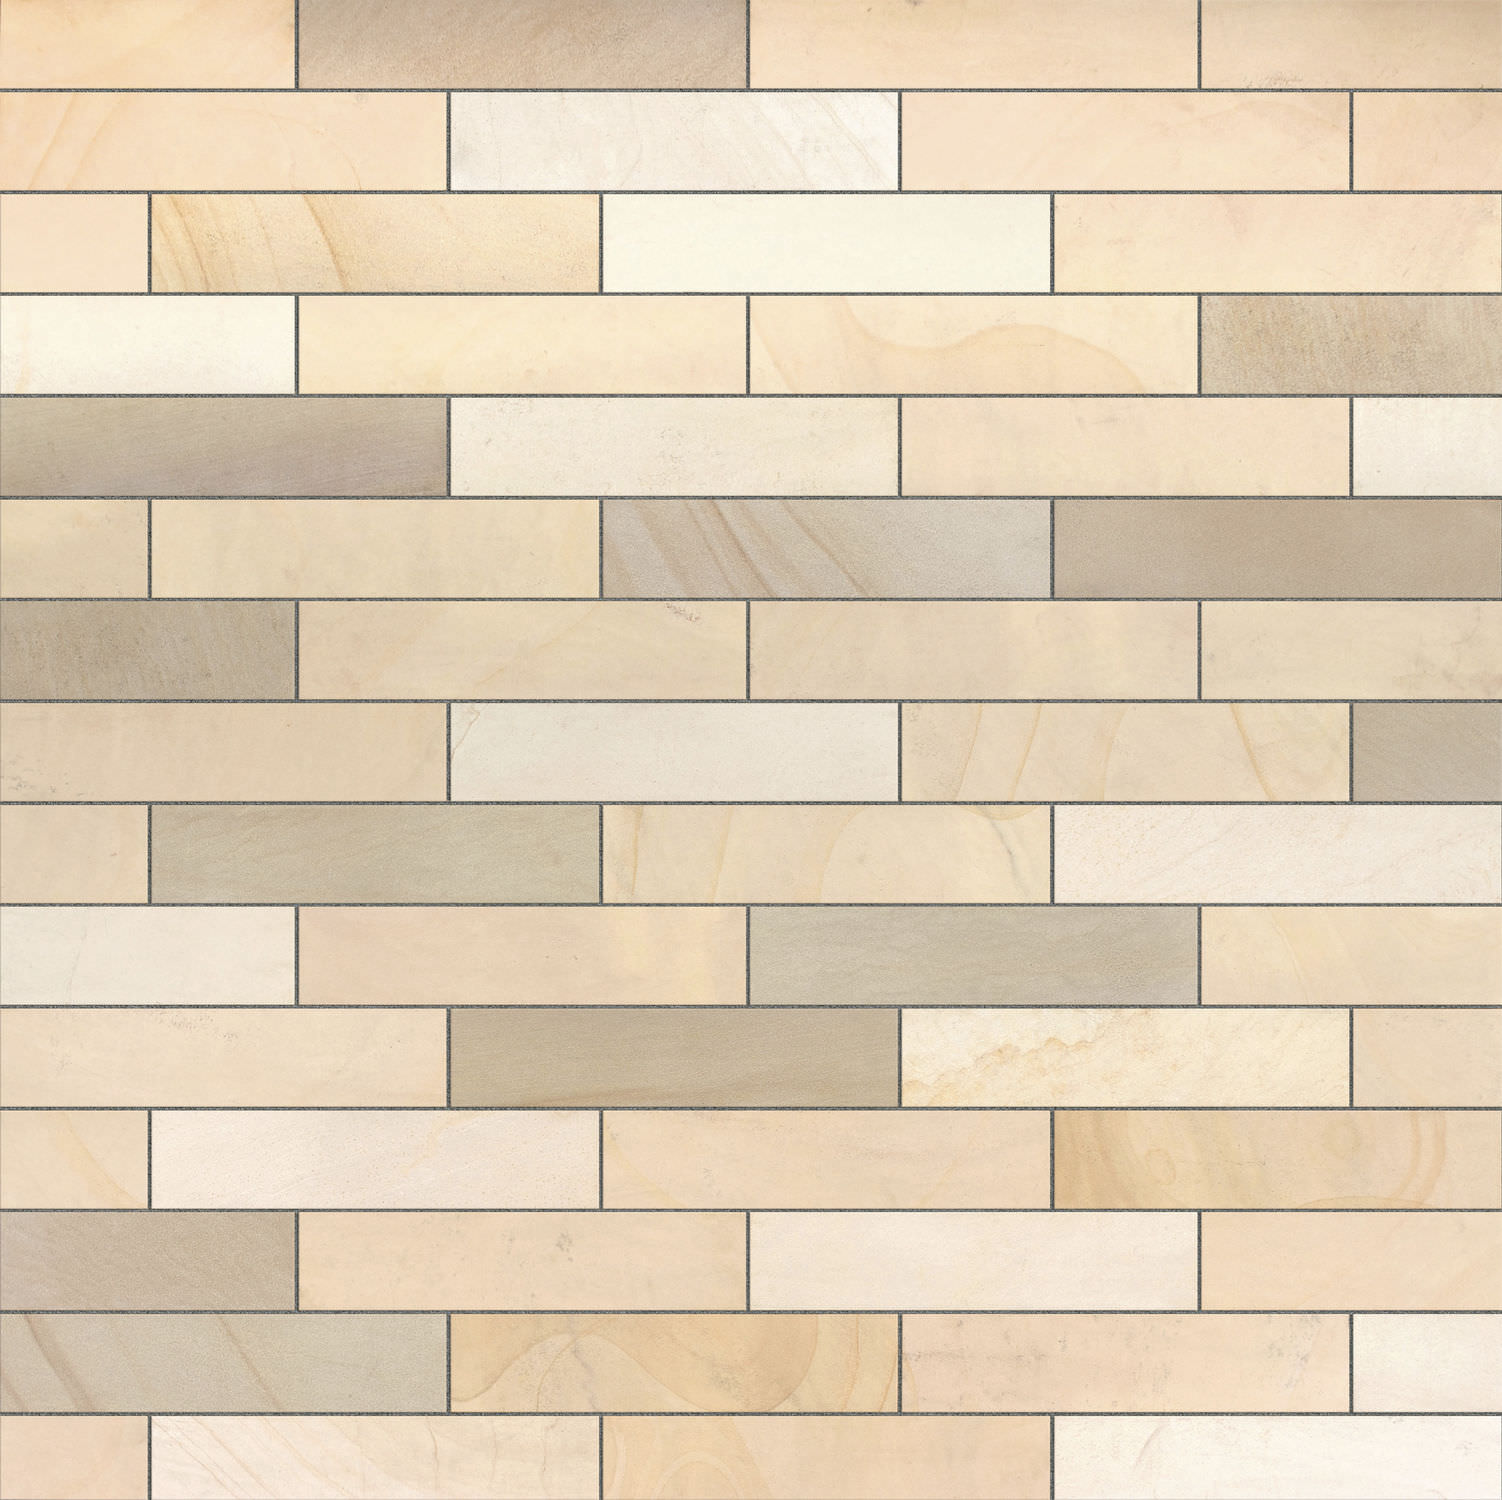 Outdoor Tile For Floors Sandstone Embossed Stonepar